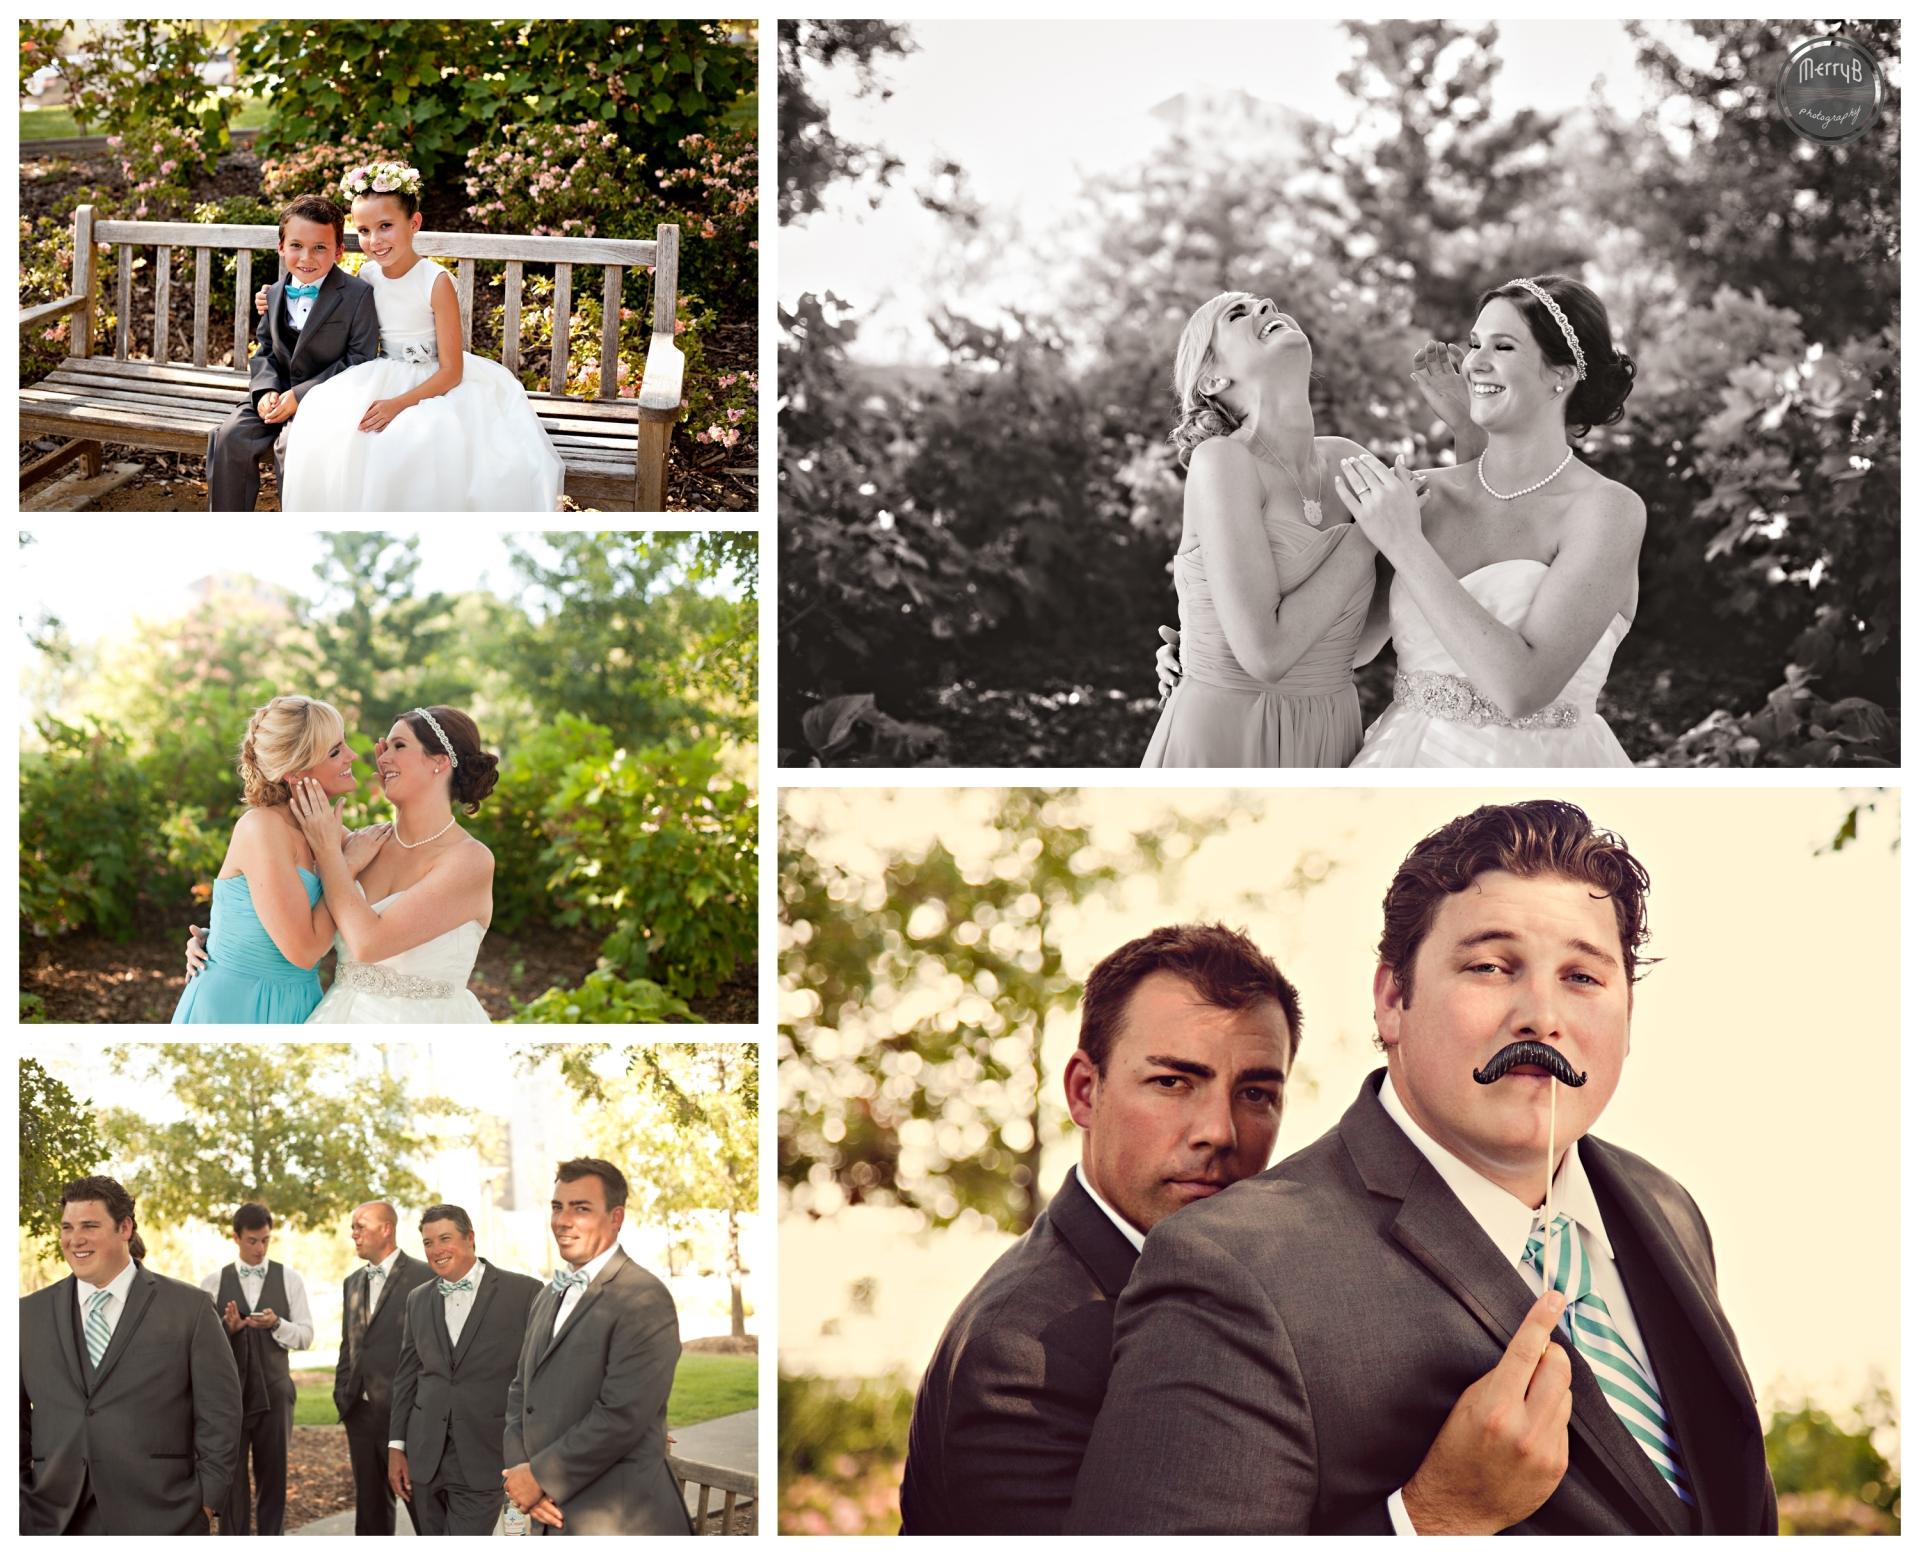 mal+jesse wedding0051